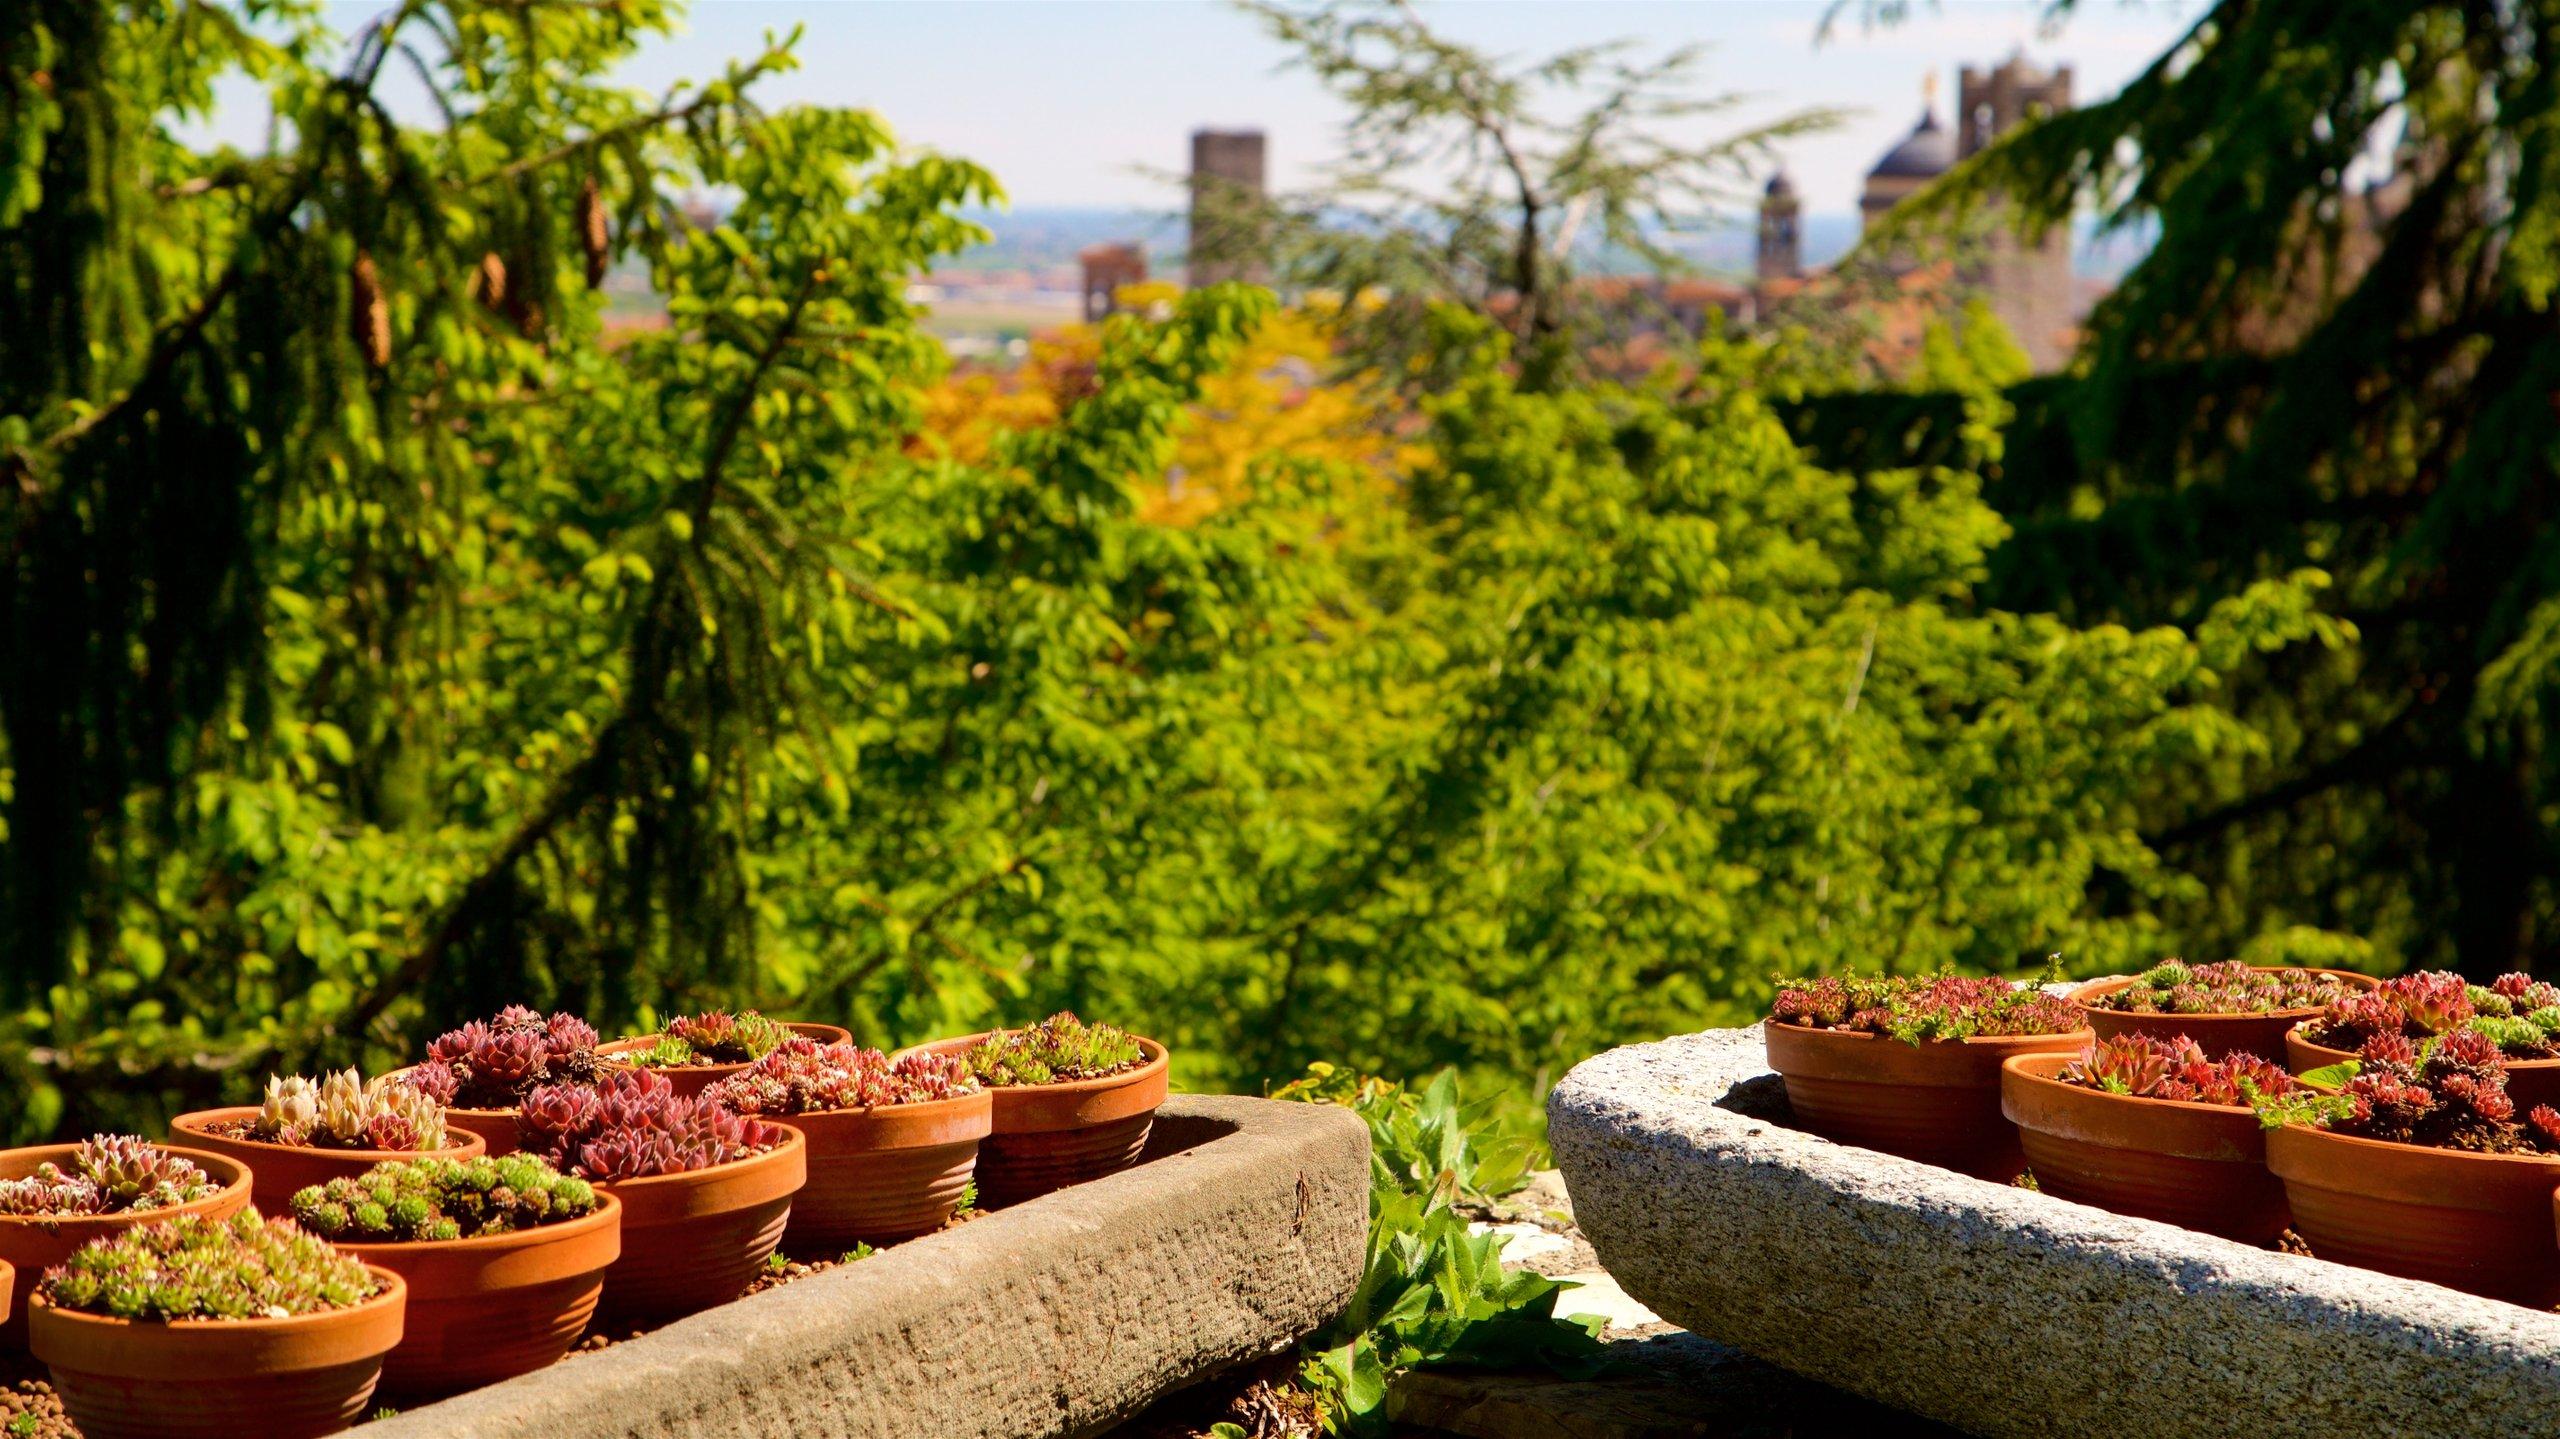 Bergamo Botanical Garden, Bergamo, Lombardy, Italy